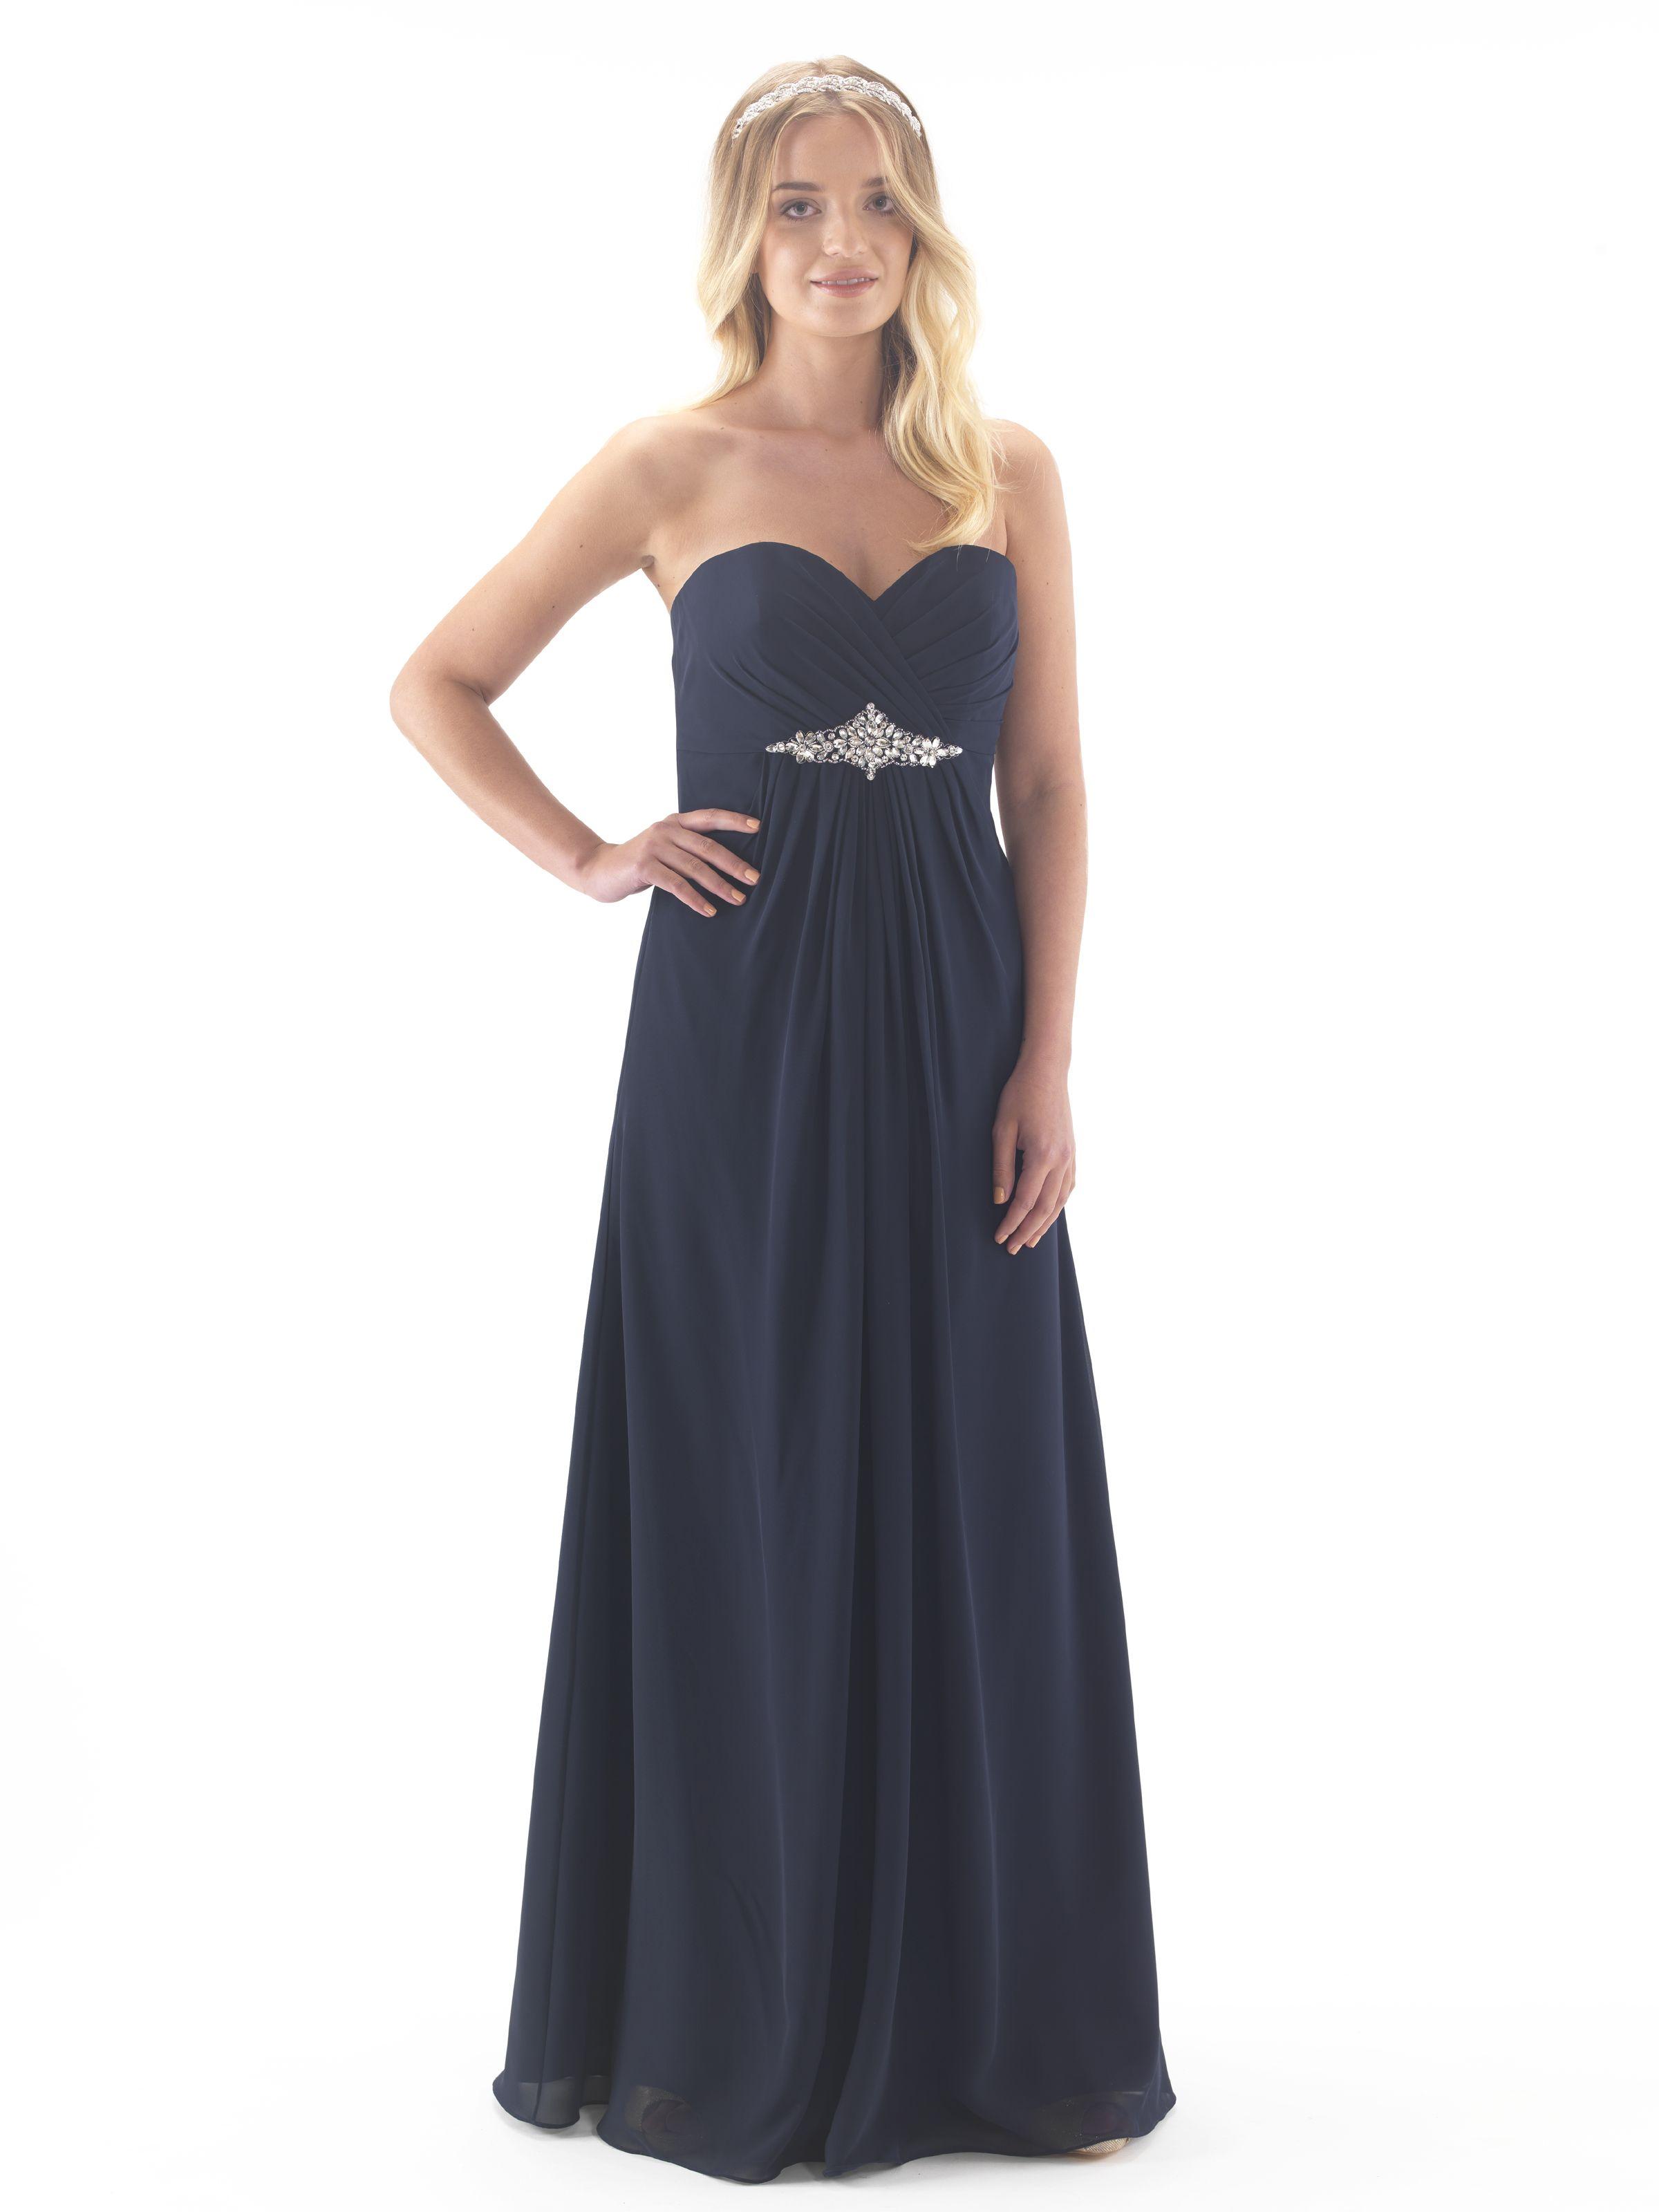 Linzi jay en388 chiffon full length bridesmaid dress sparkle linzi jay en388 chiffon full length bridesmaid dress ombrellifo Image collections